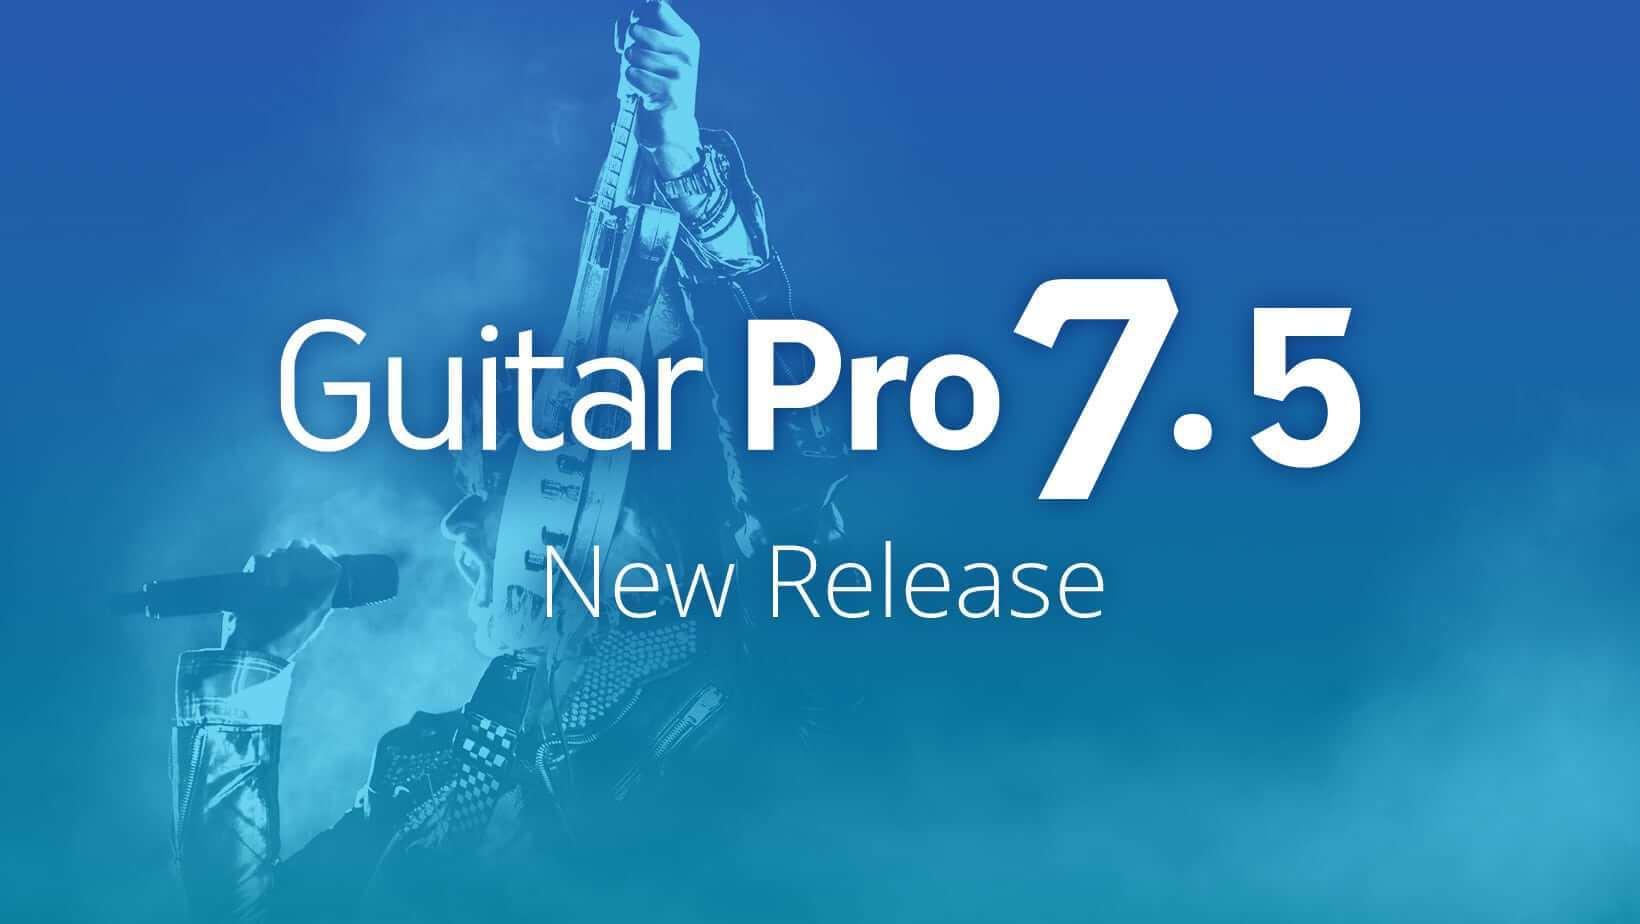 Guitar Pro 7.5.3 Crack